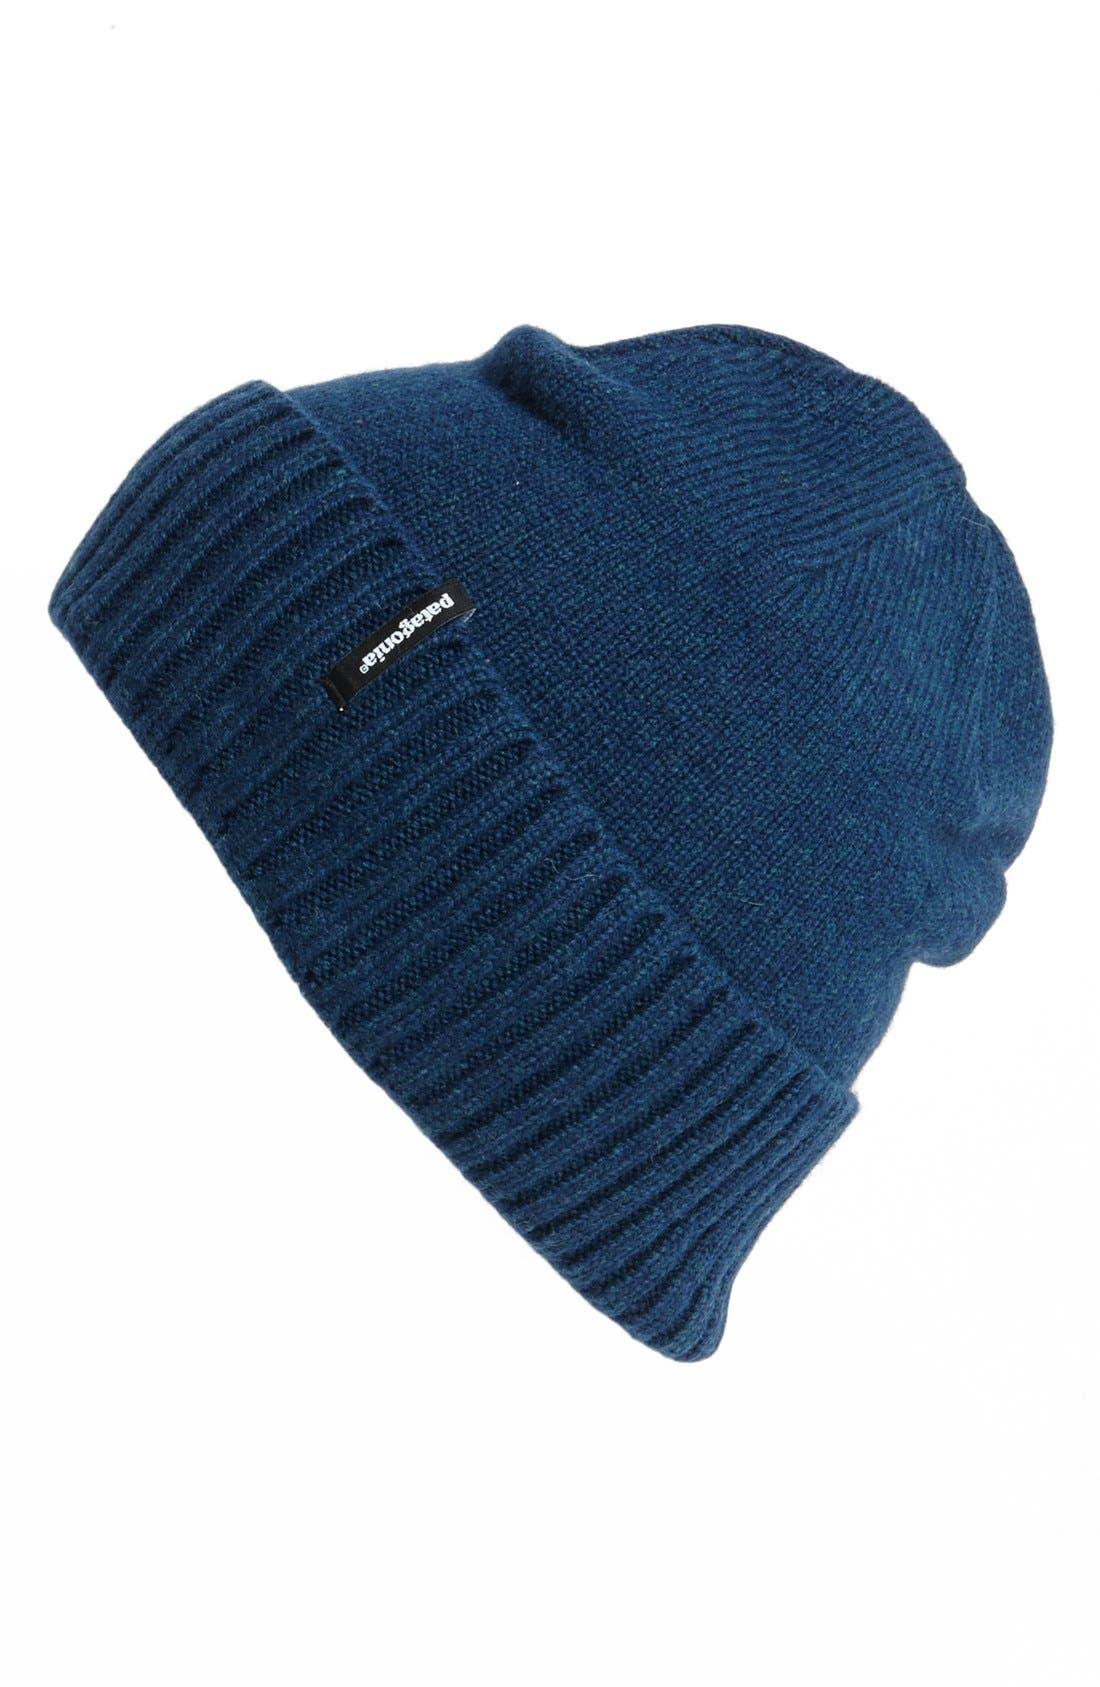 Main Image - Patagonia 'Brodeo' Merino Wool Blend Beanie